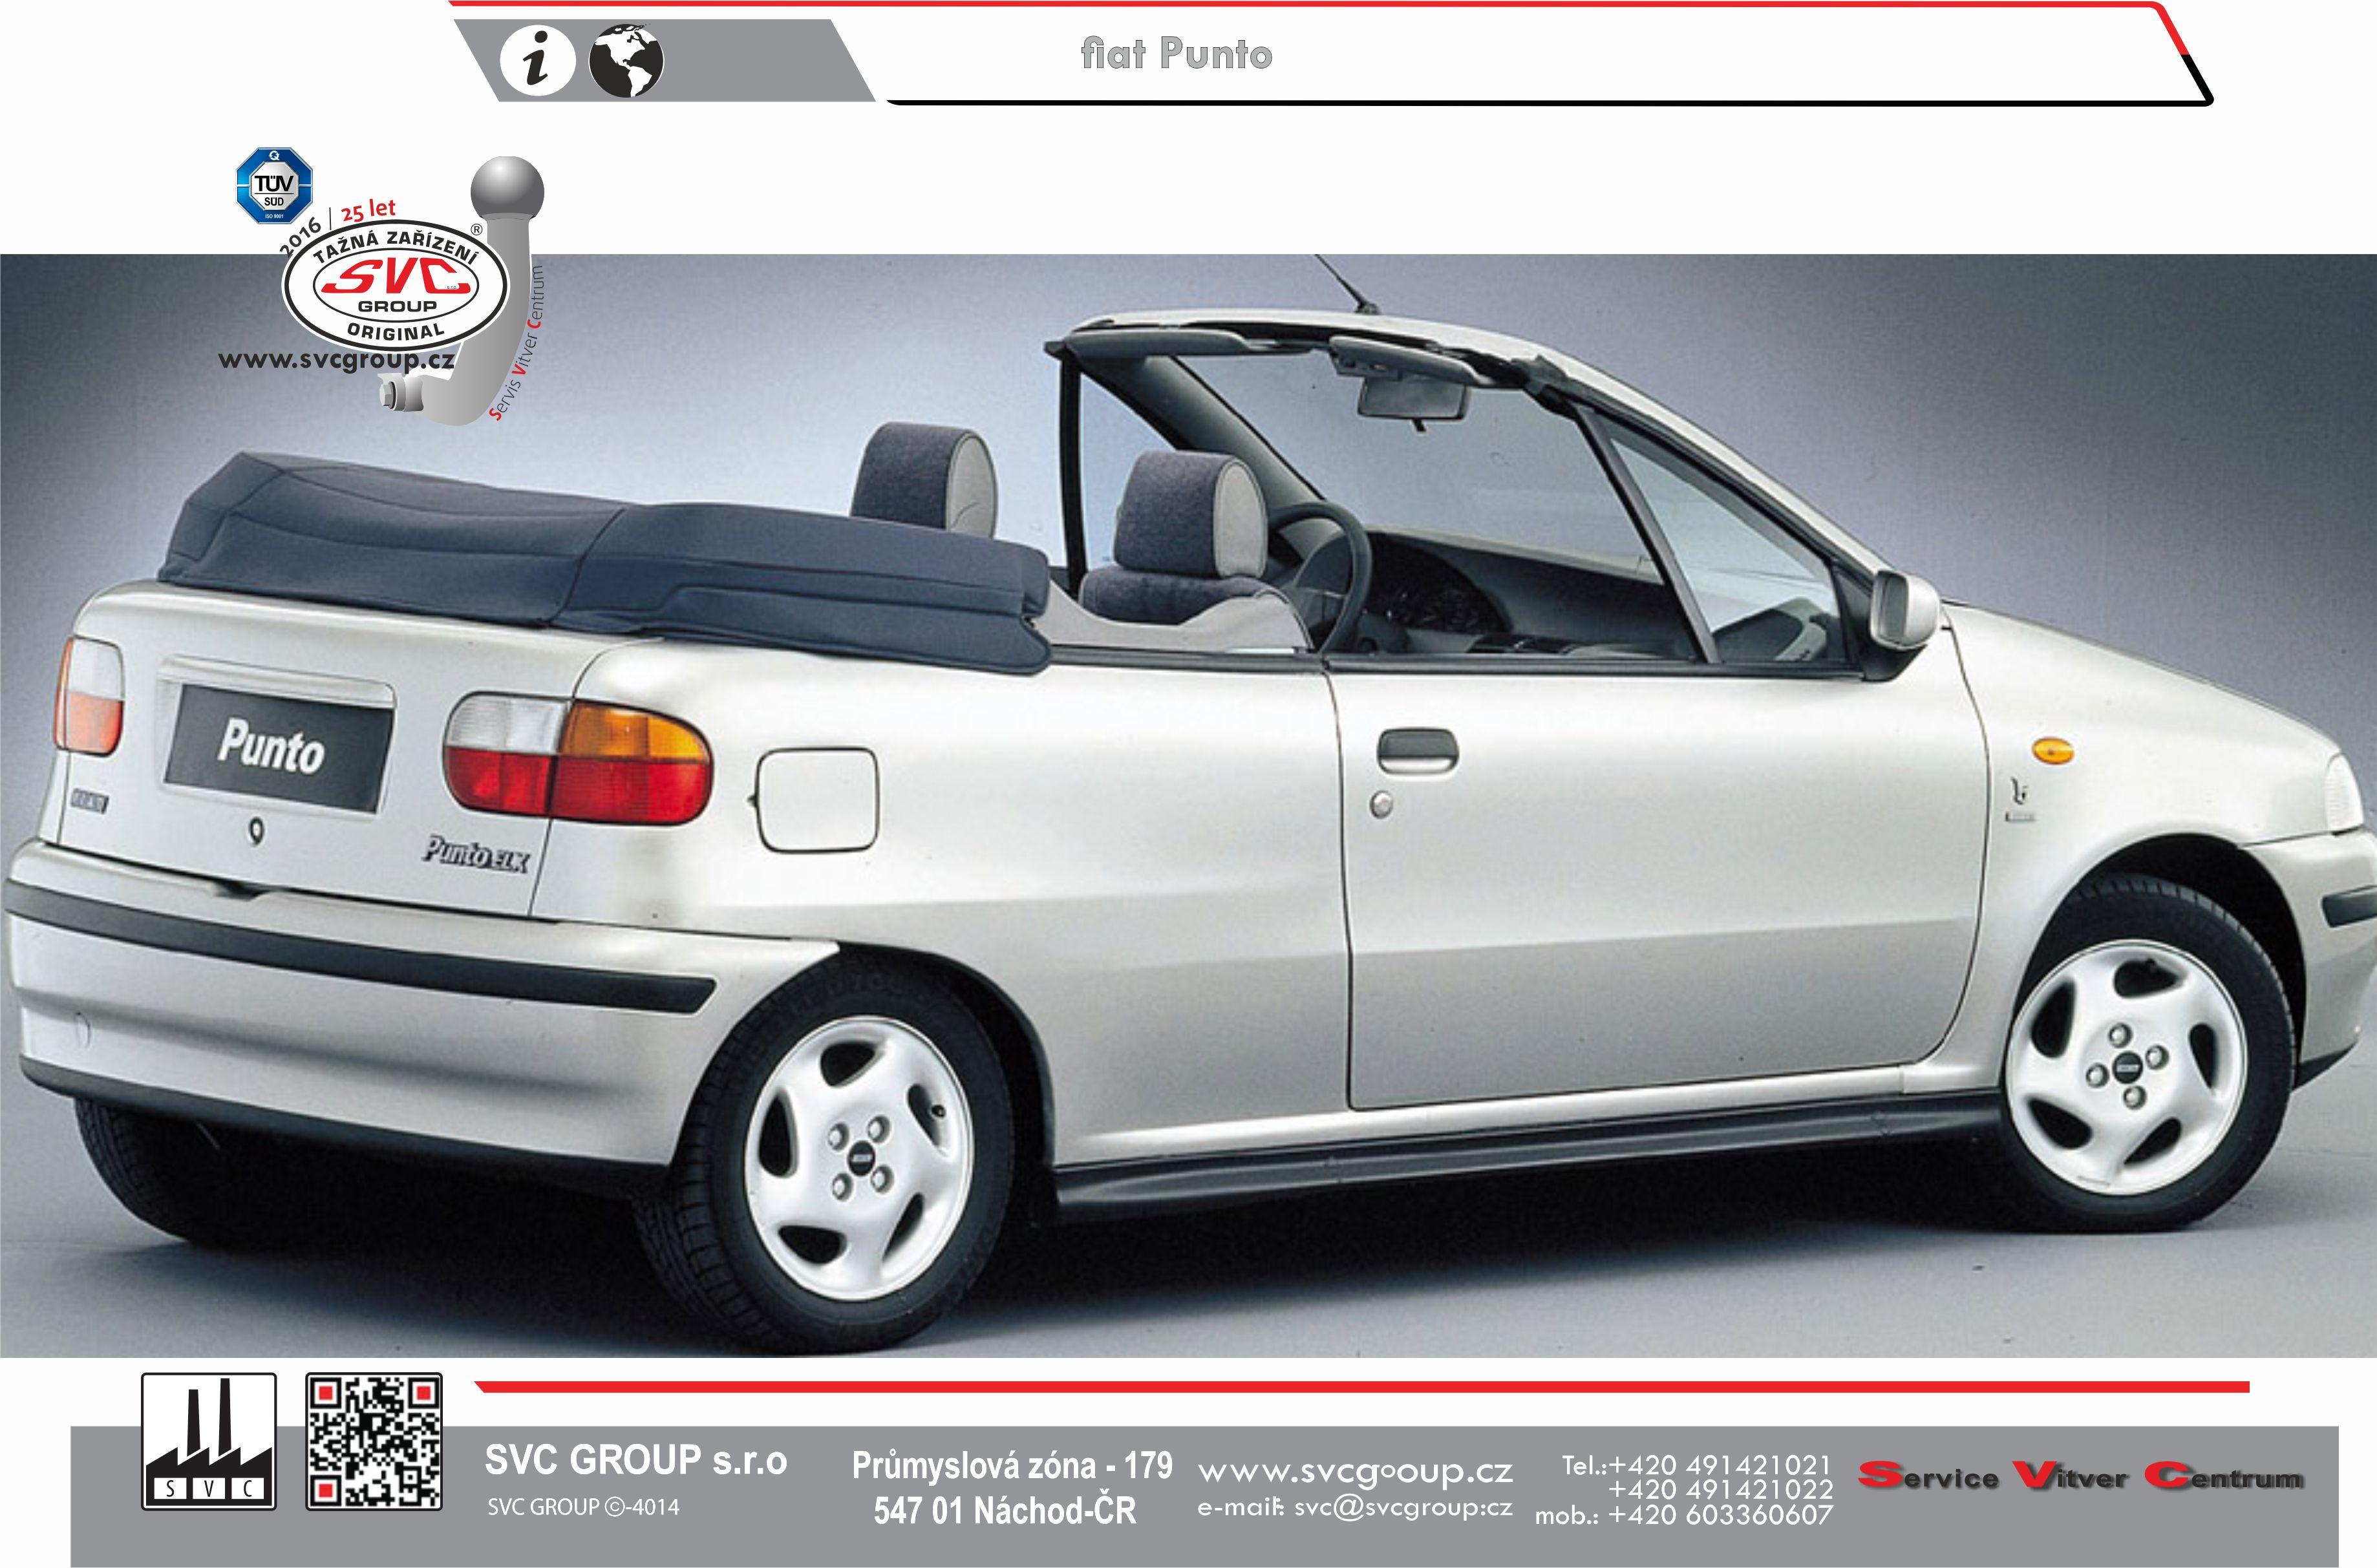 Fiat Punto Kabriolet